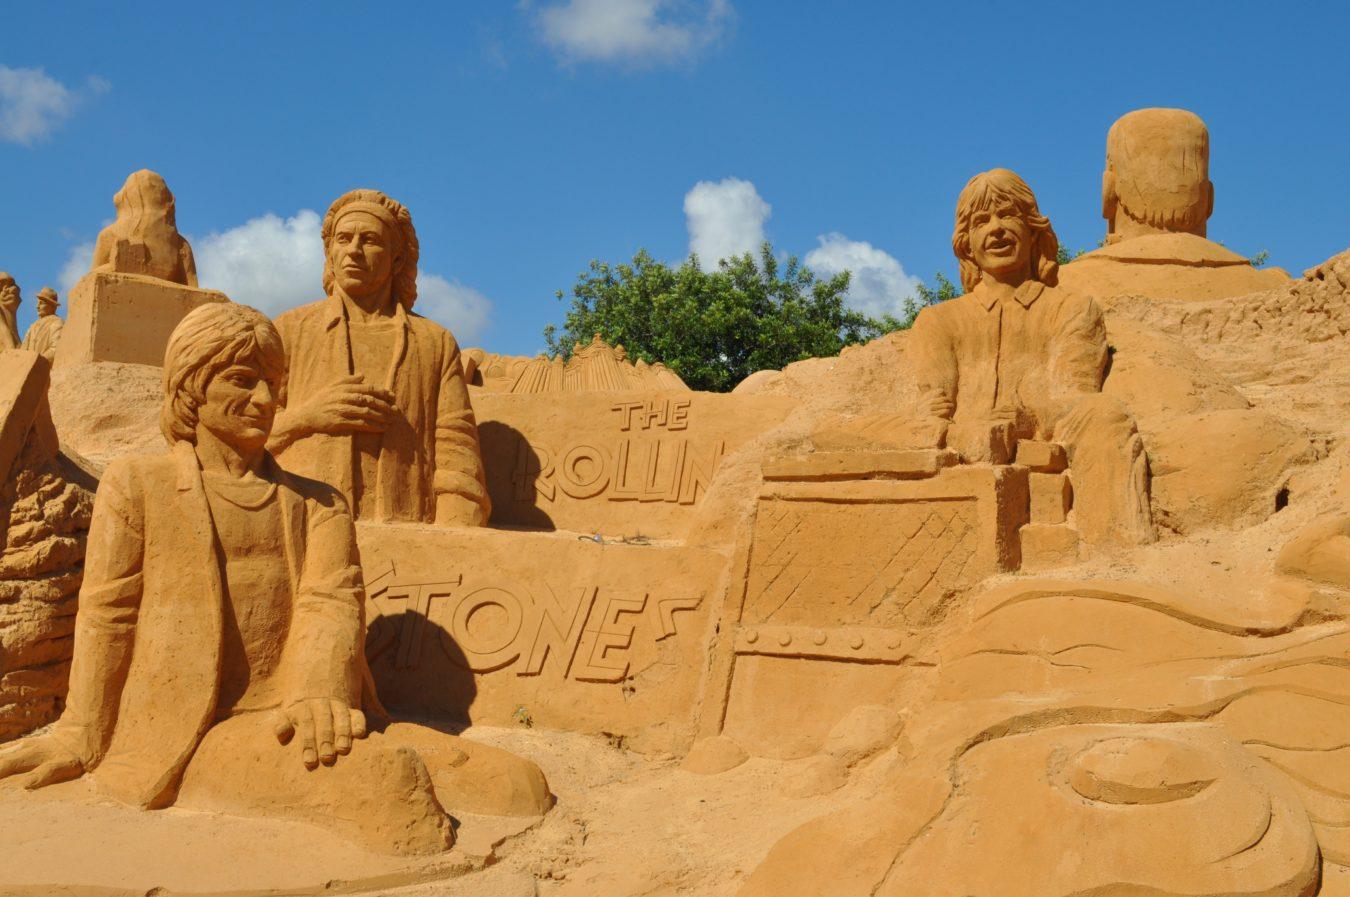 landscape-sand-rock-desert-monument-formation-921594-pxhere.com